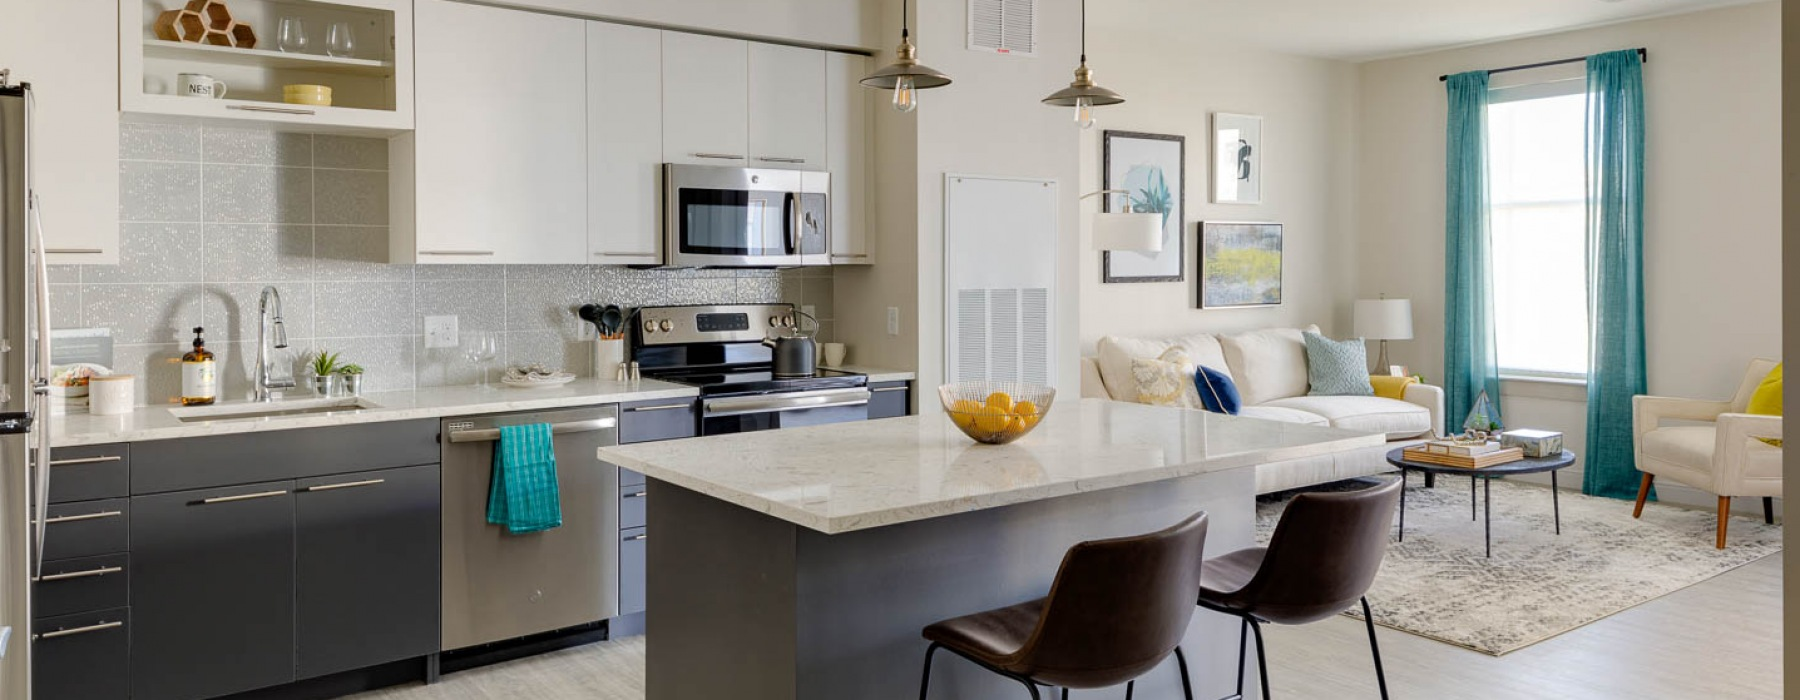 Emery kitchen